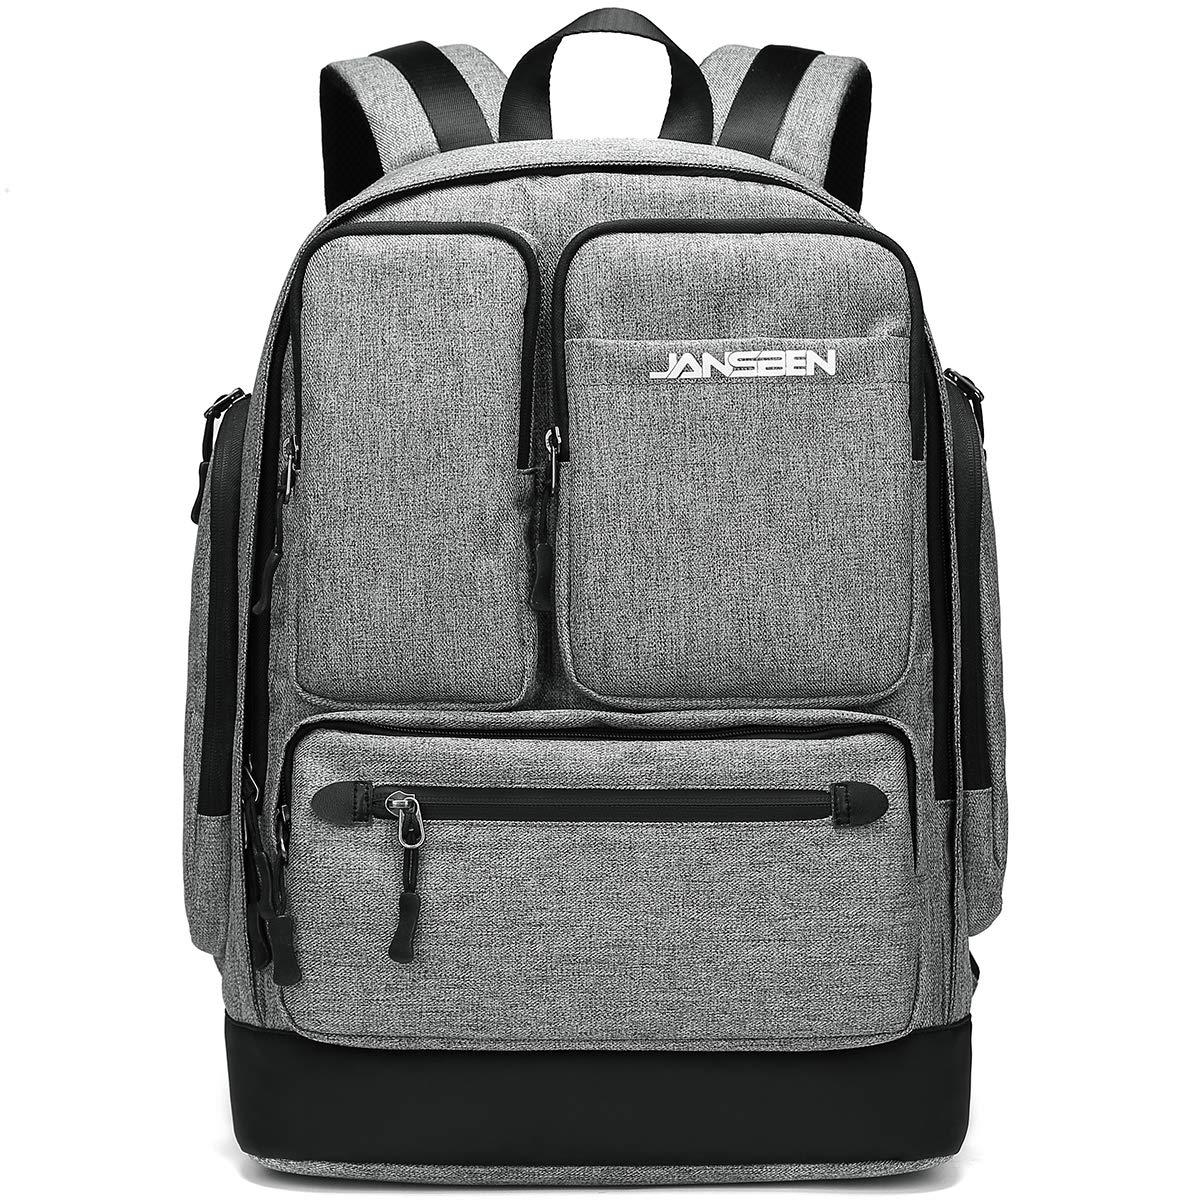 JANSBEN Impermeabile Laptop Zaino per Donna Uomo Scuola Backpack con porta di ricarica USB balck Casual Business Uni Zaino Universit/à Daypack per 15.6 pc Cumputer